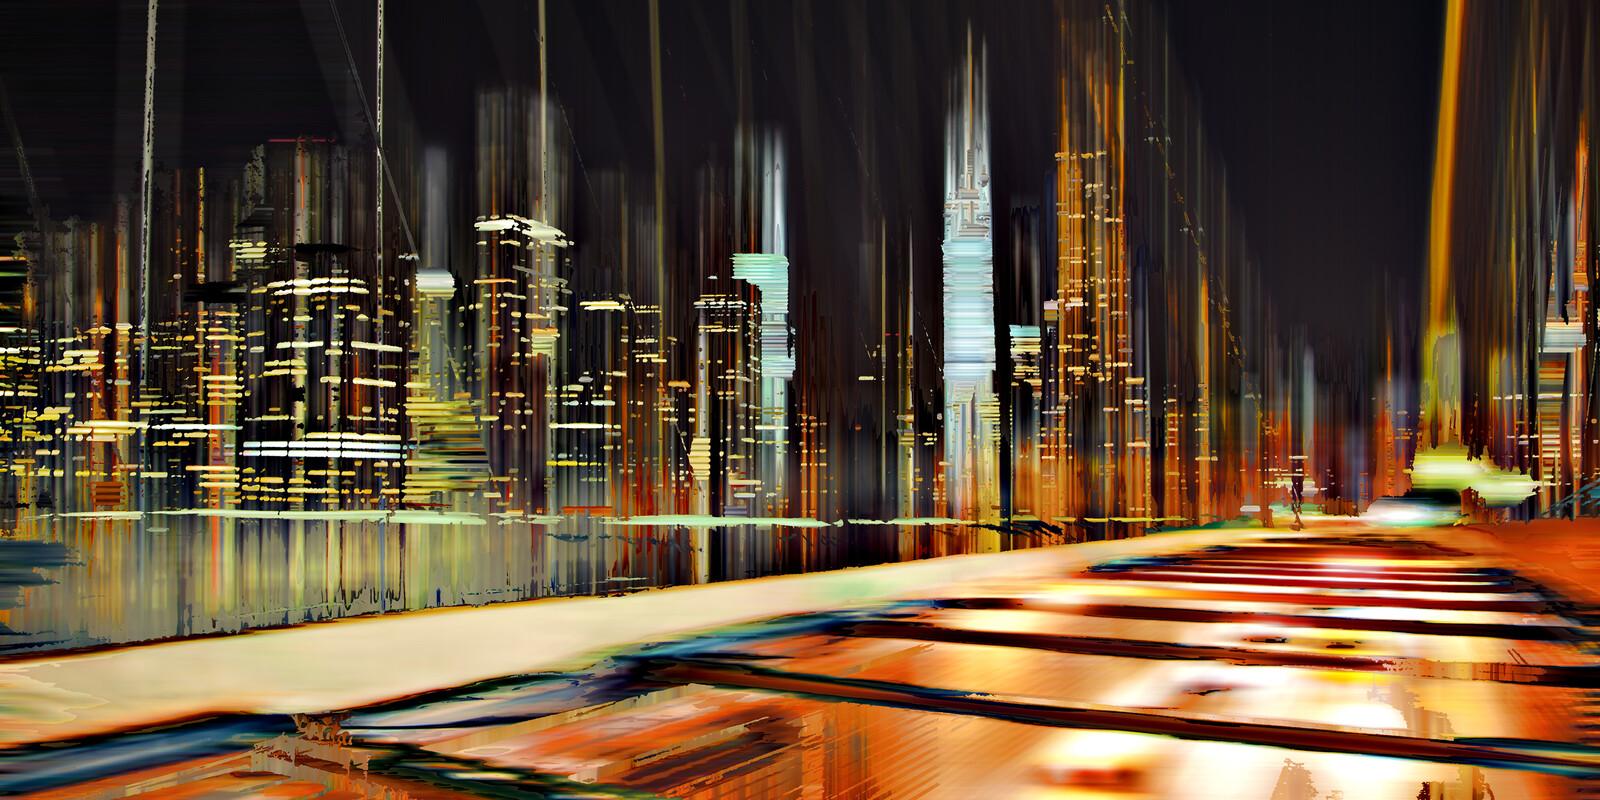 NY Projection LVII - Sabine Wild